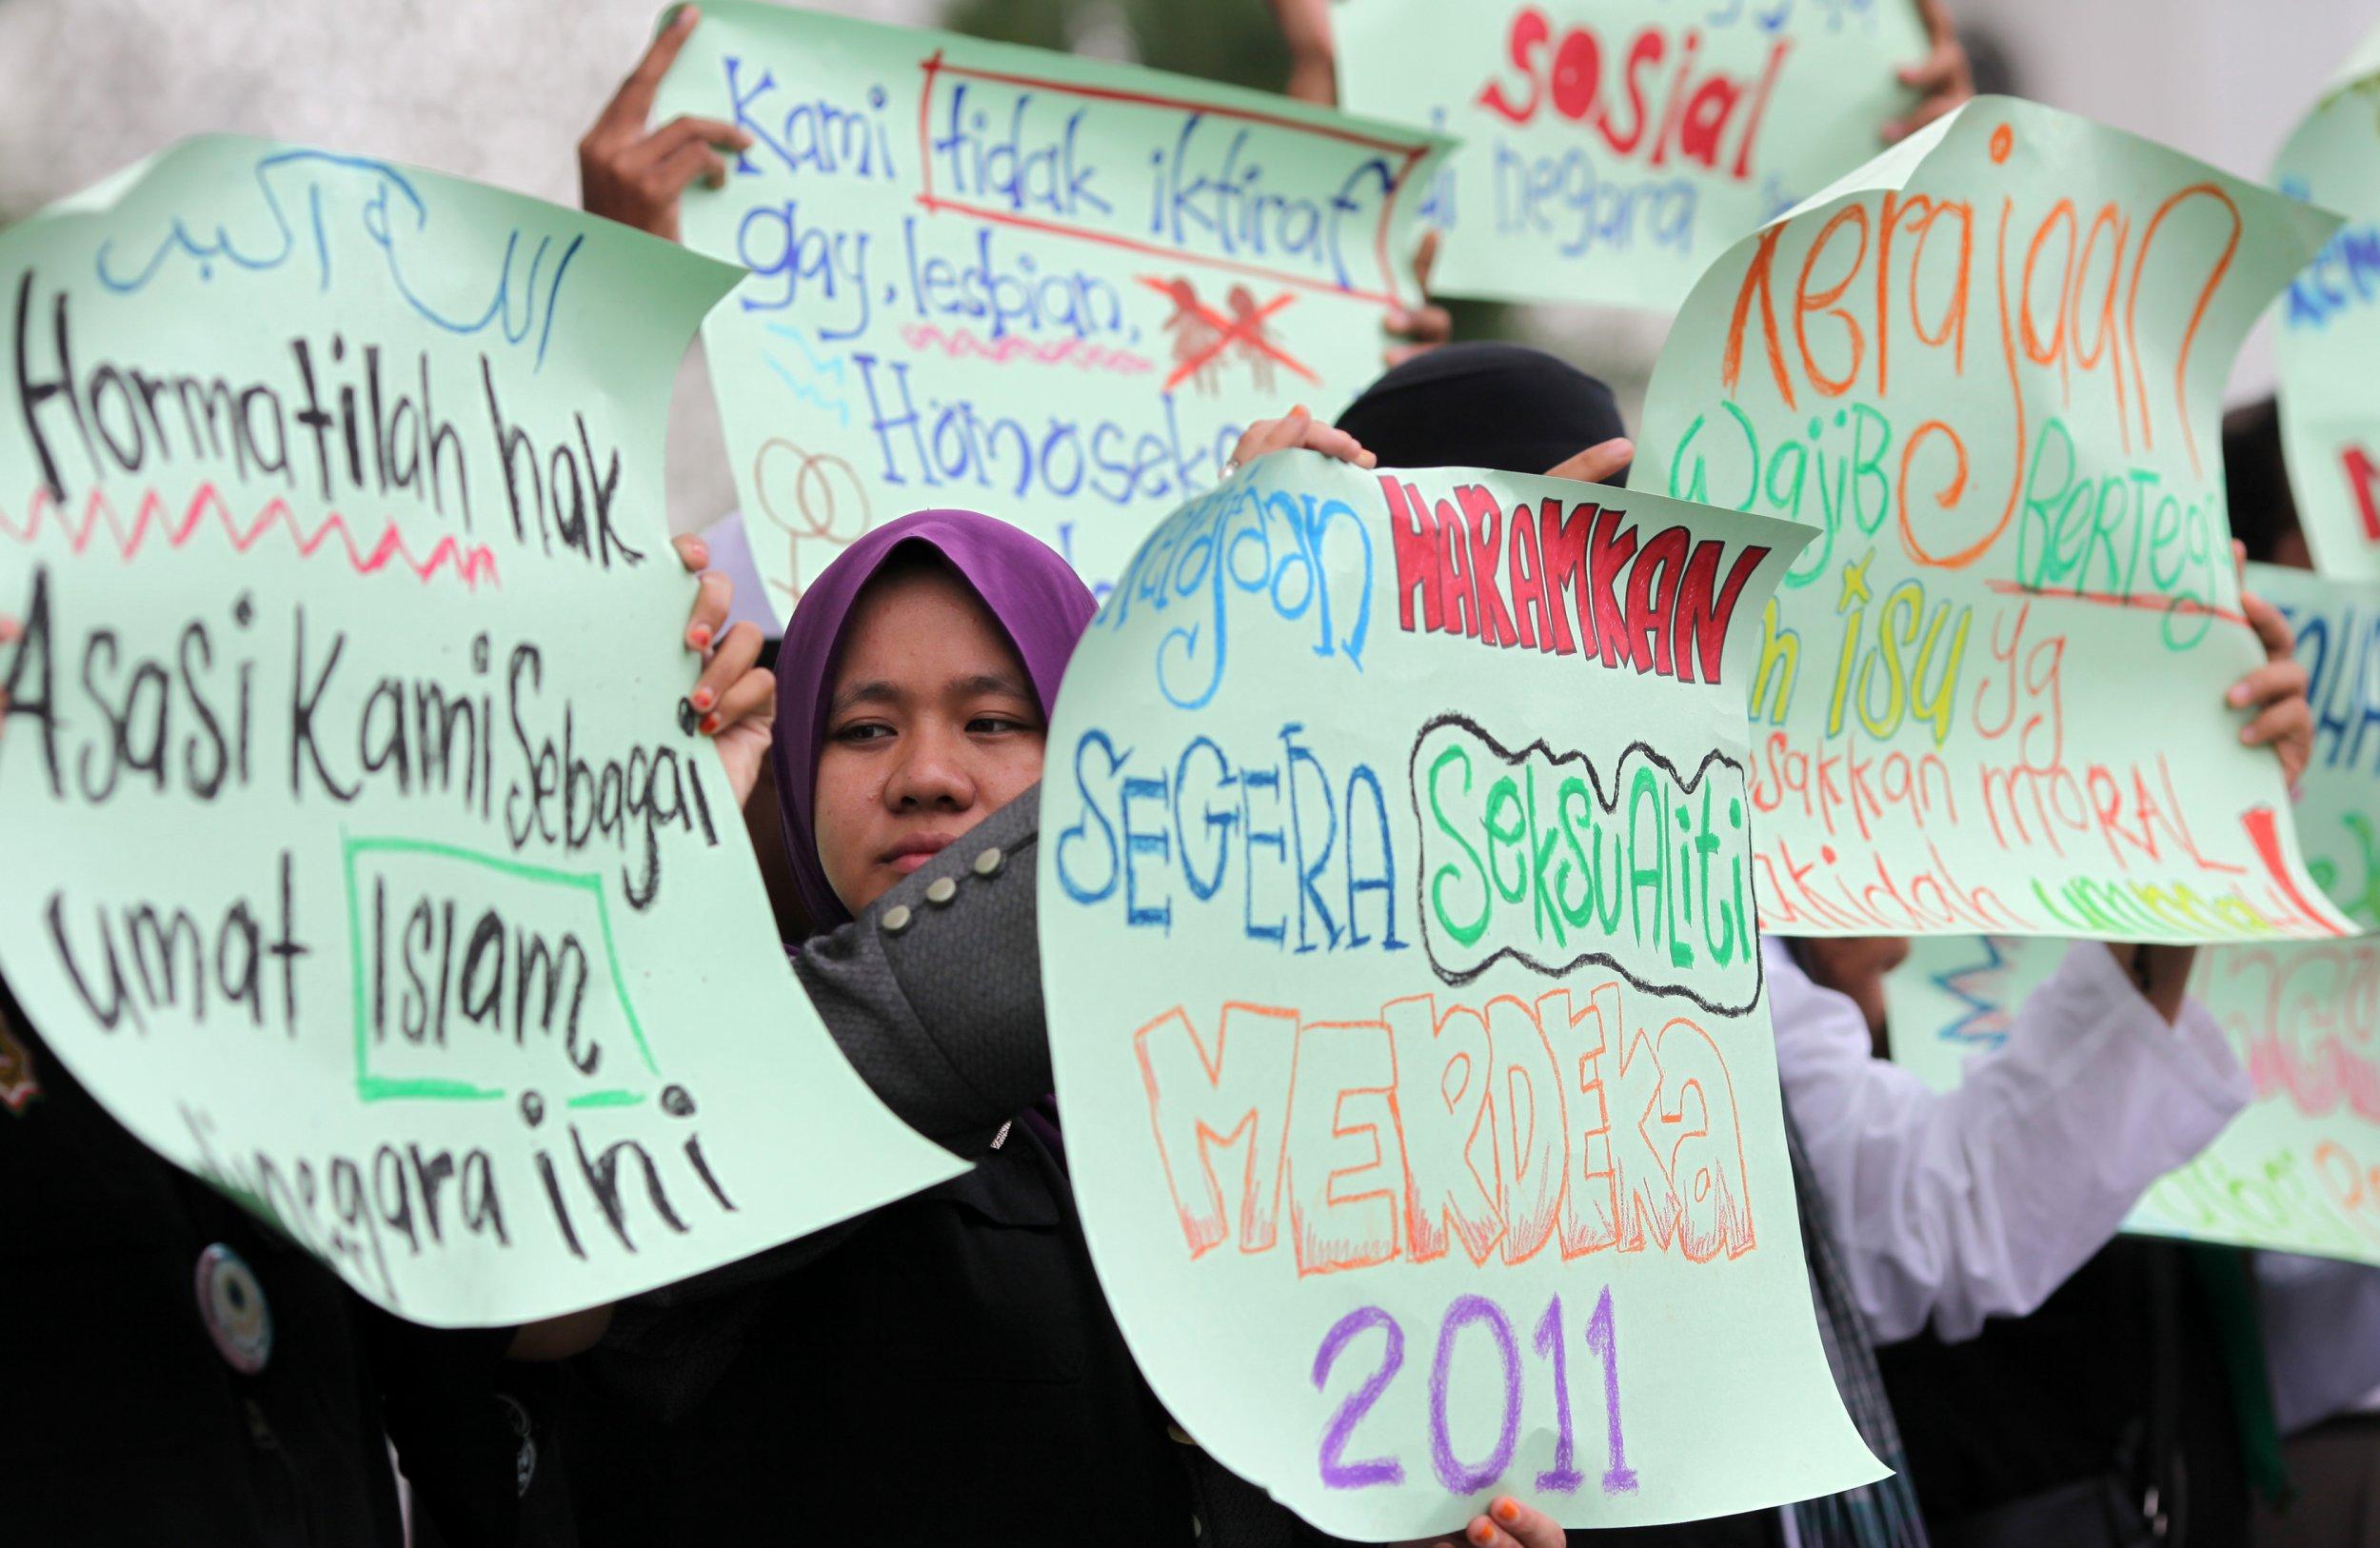 Malaysian LGBT/ Reverse Homosexuality